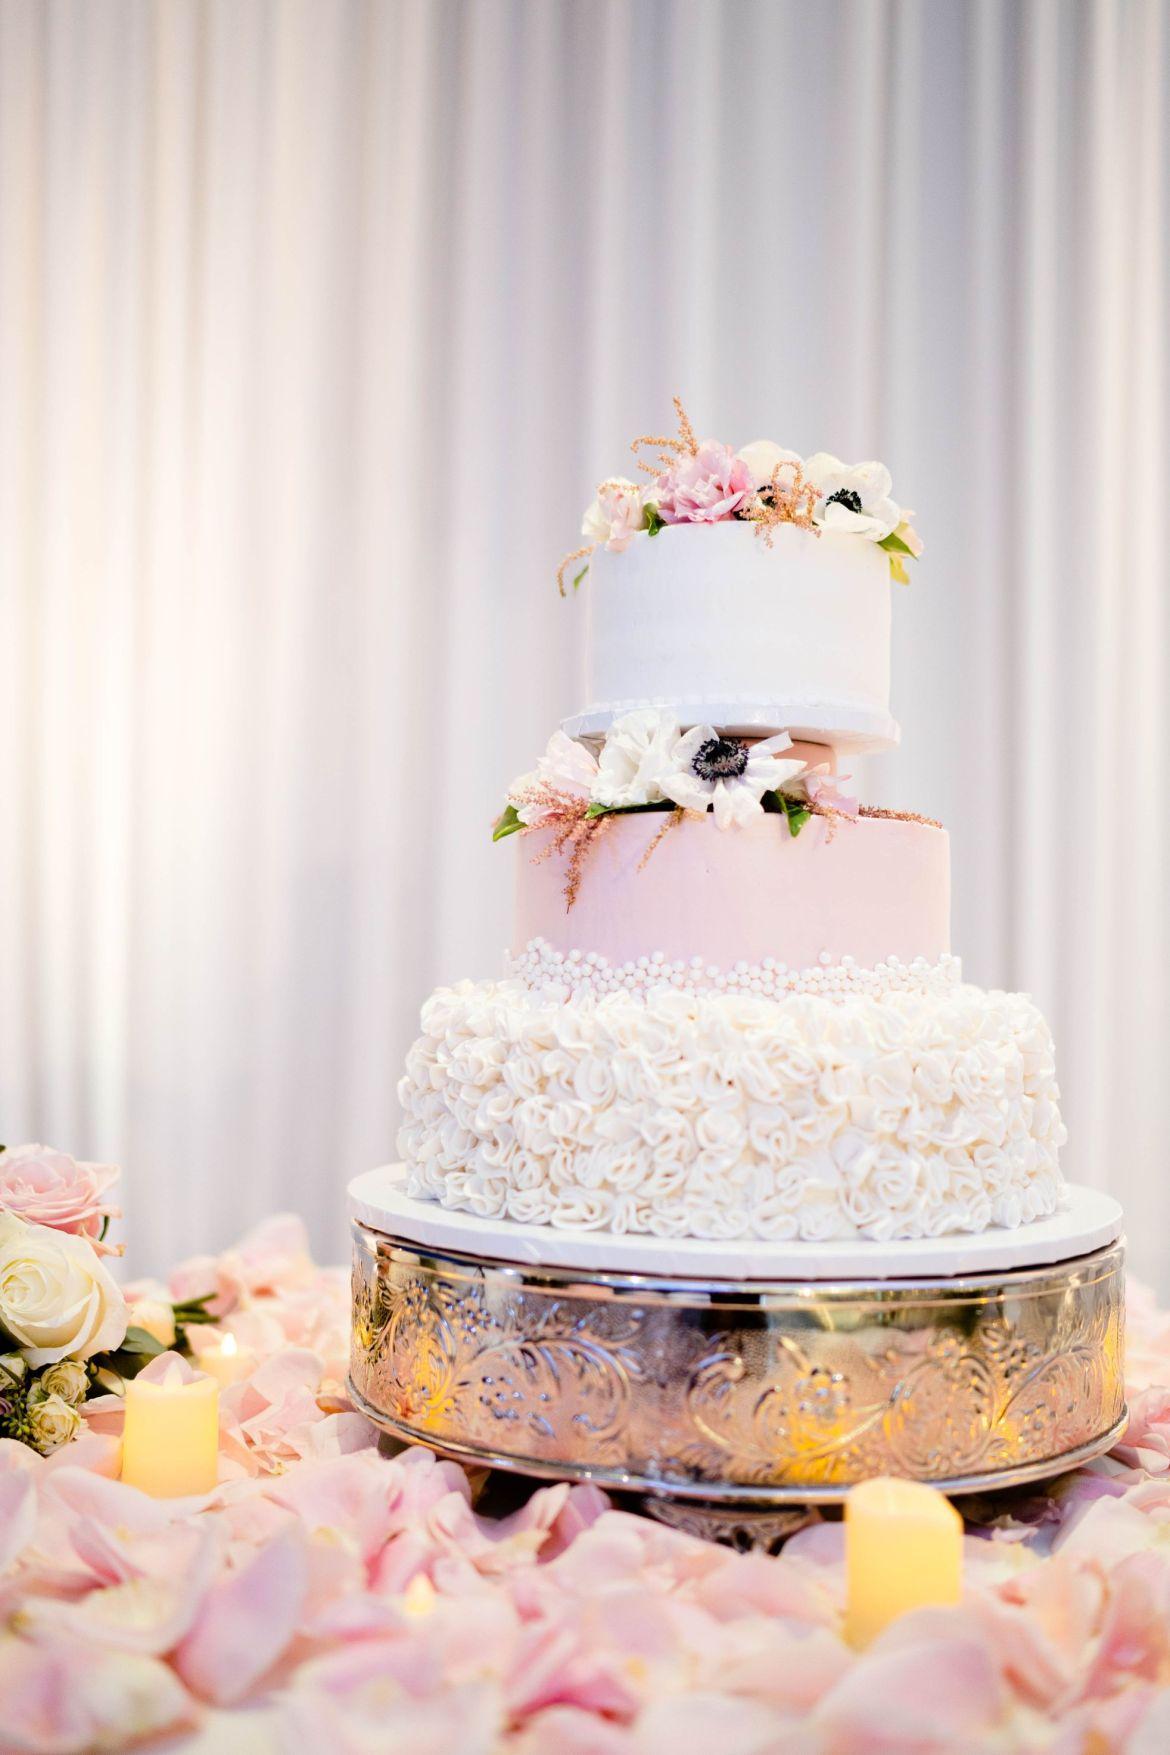 porto's bakery wedding cake